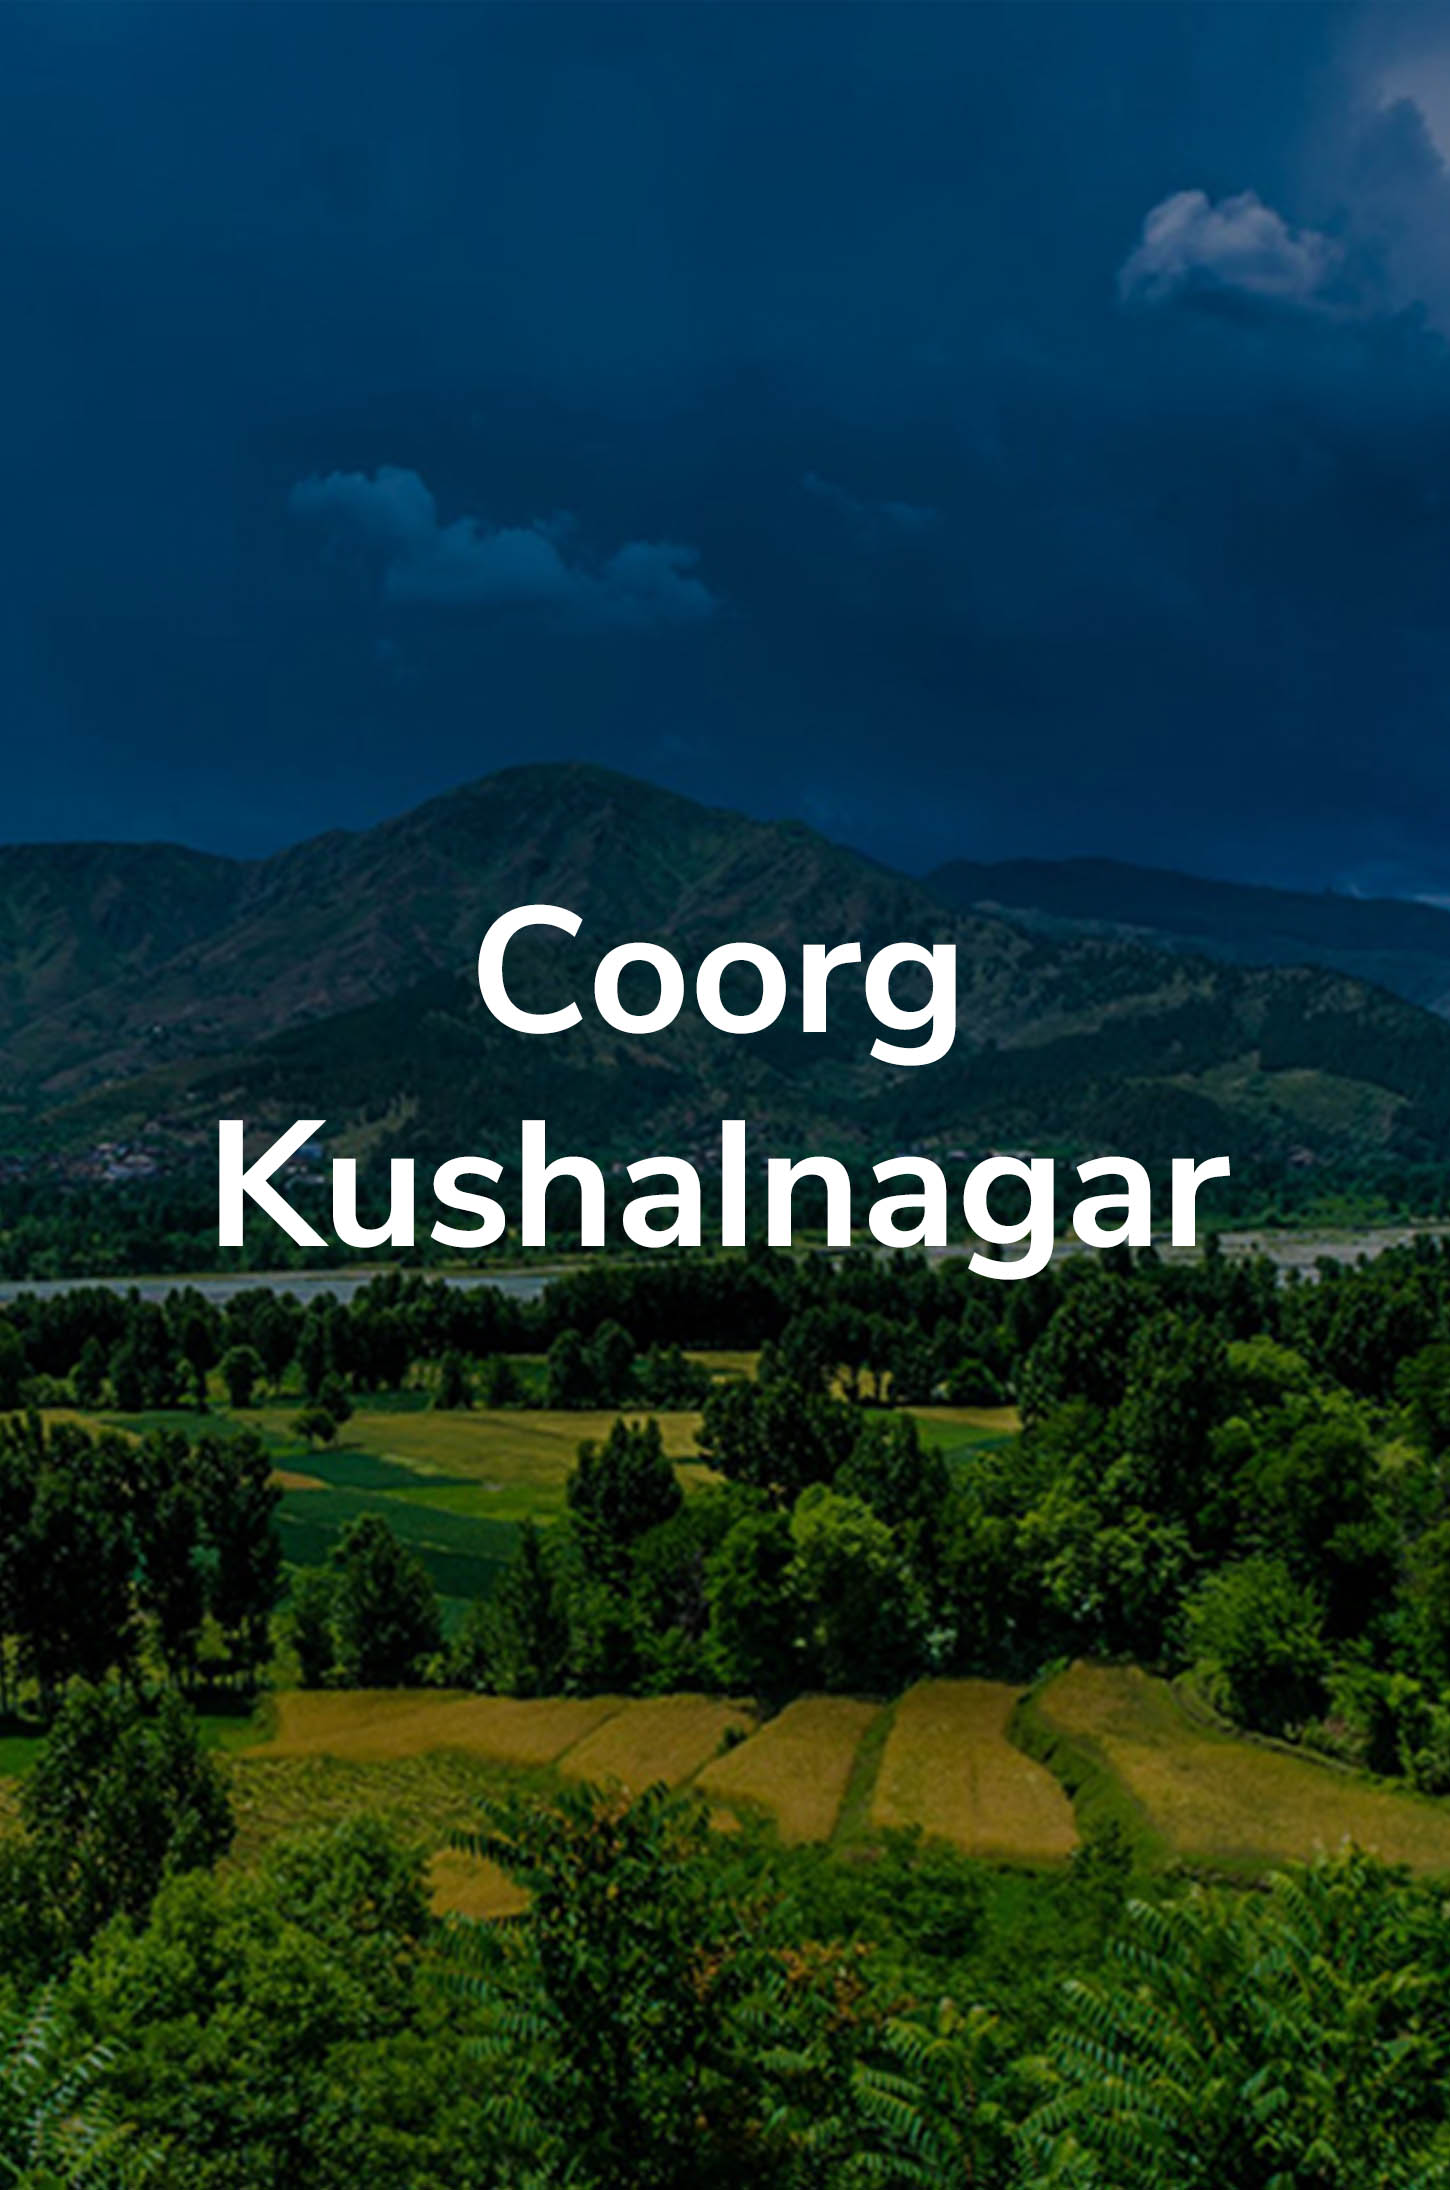 CoorgKushalnagar